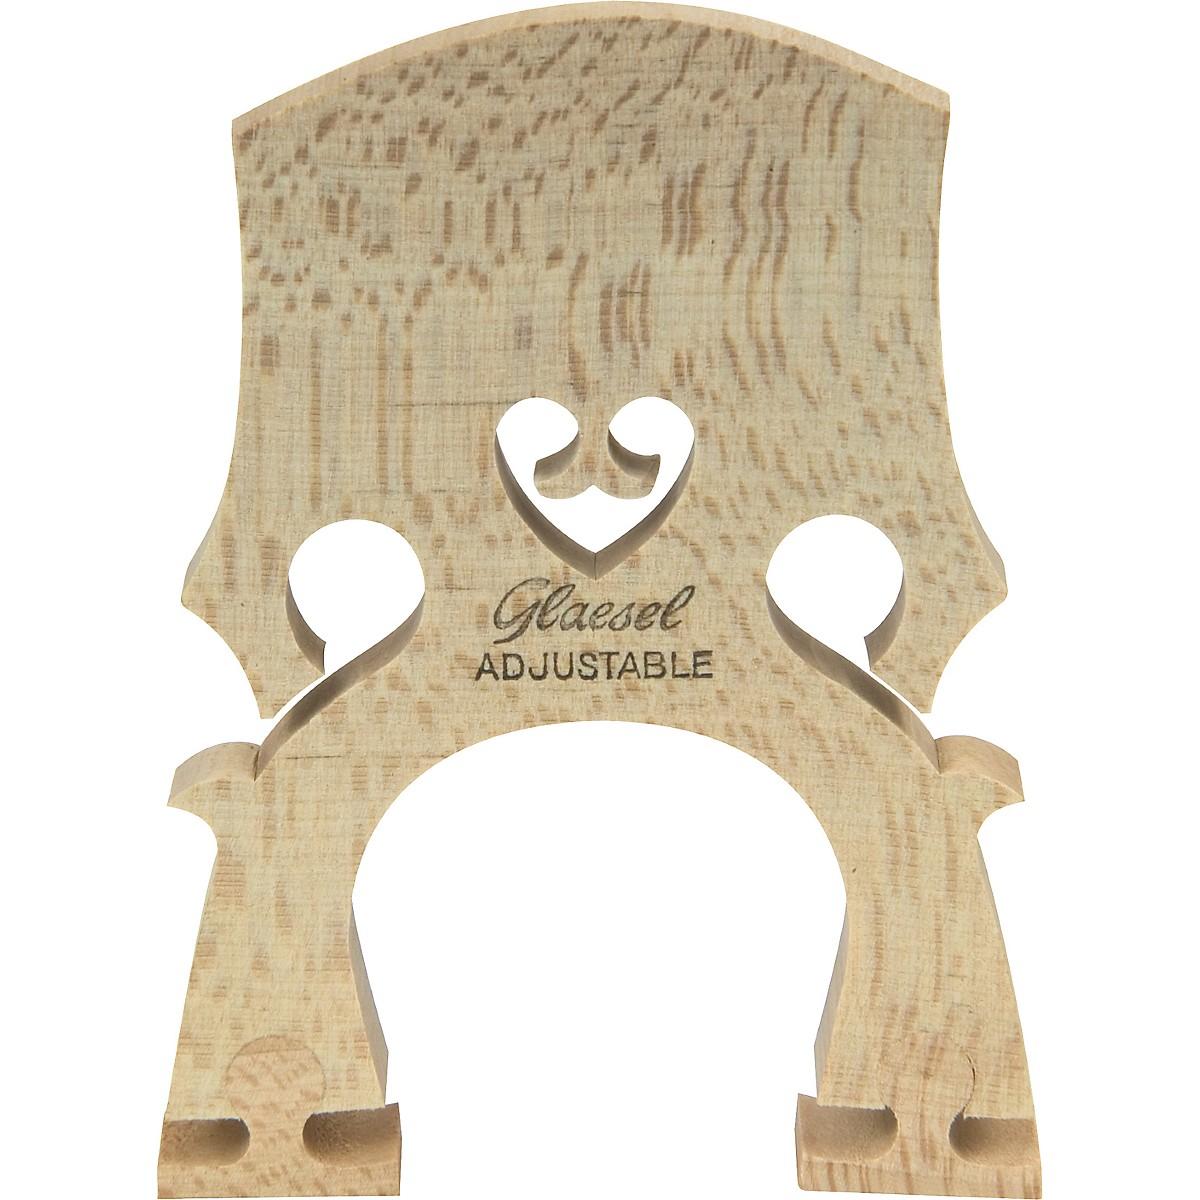 Glaesel Self-Adjusting 1/4 Cello Bridge